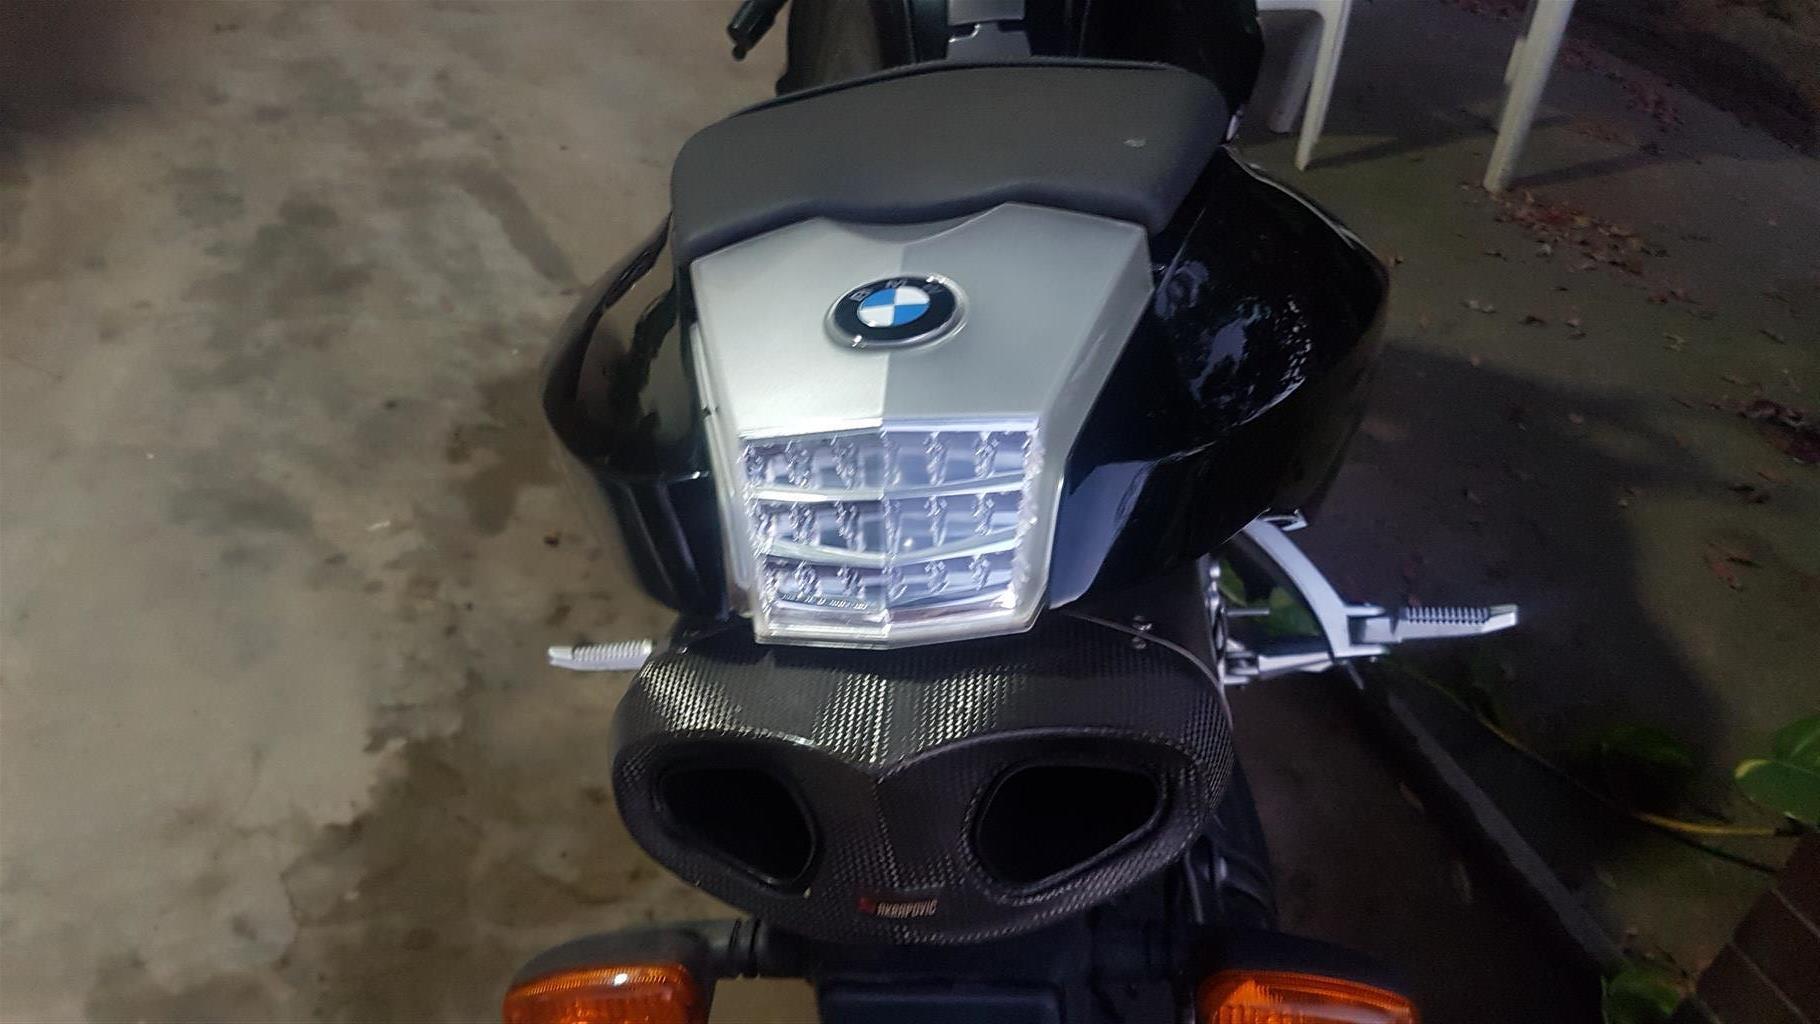 2009 BMW R1200 S